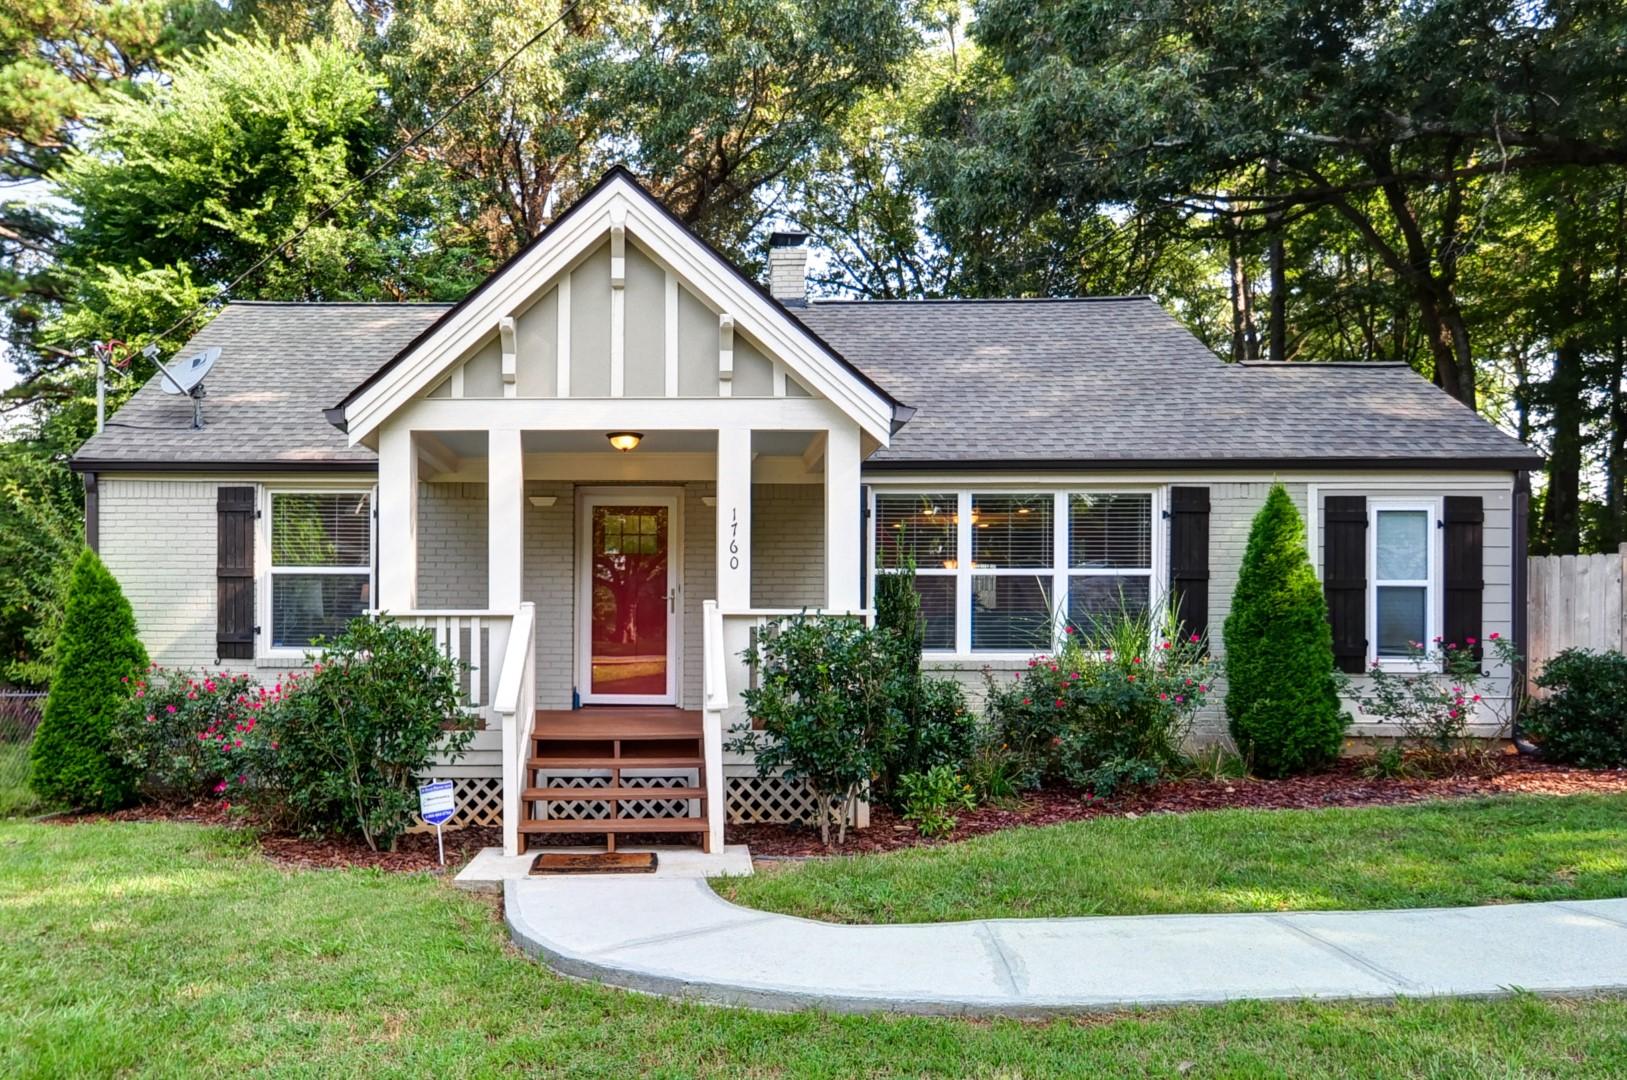 Einfamilienhaus für Verkauf beim Absolutely Charming Bungalow in East Atlanta 1760 Clifton Way SE East Atlanta, Atlanta, Georgia 30316 Vereinigte Staaten